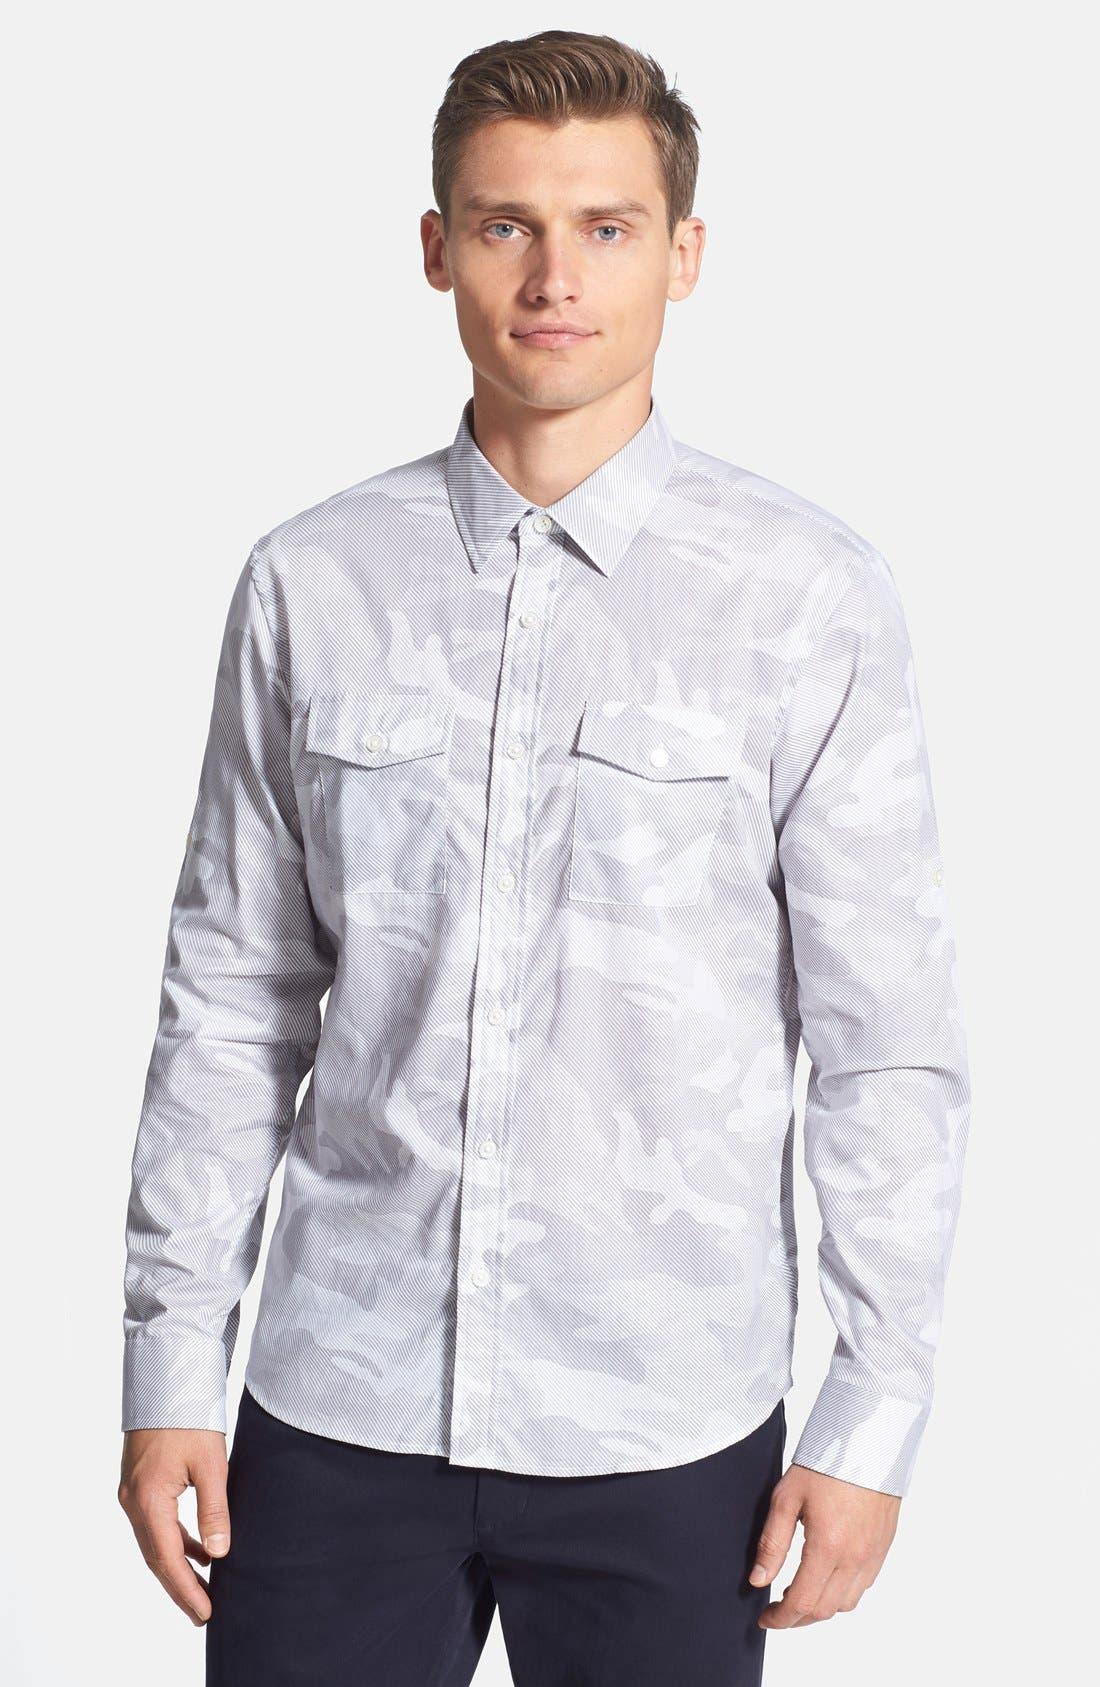 Alternate Image 1 Selected - Michael Kors Camo Print Sport Shirt